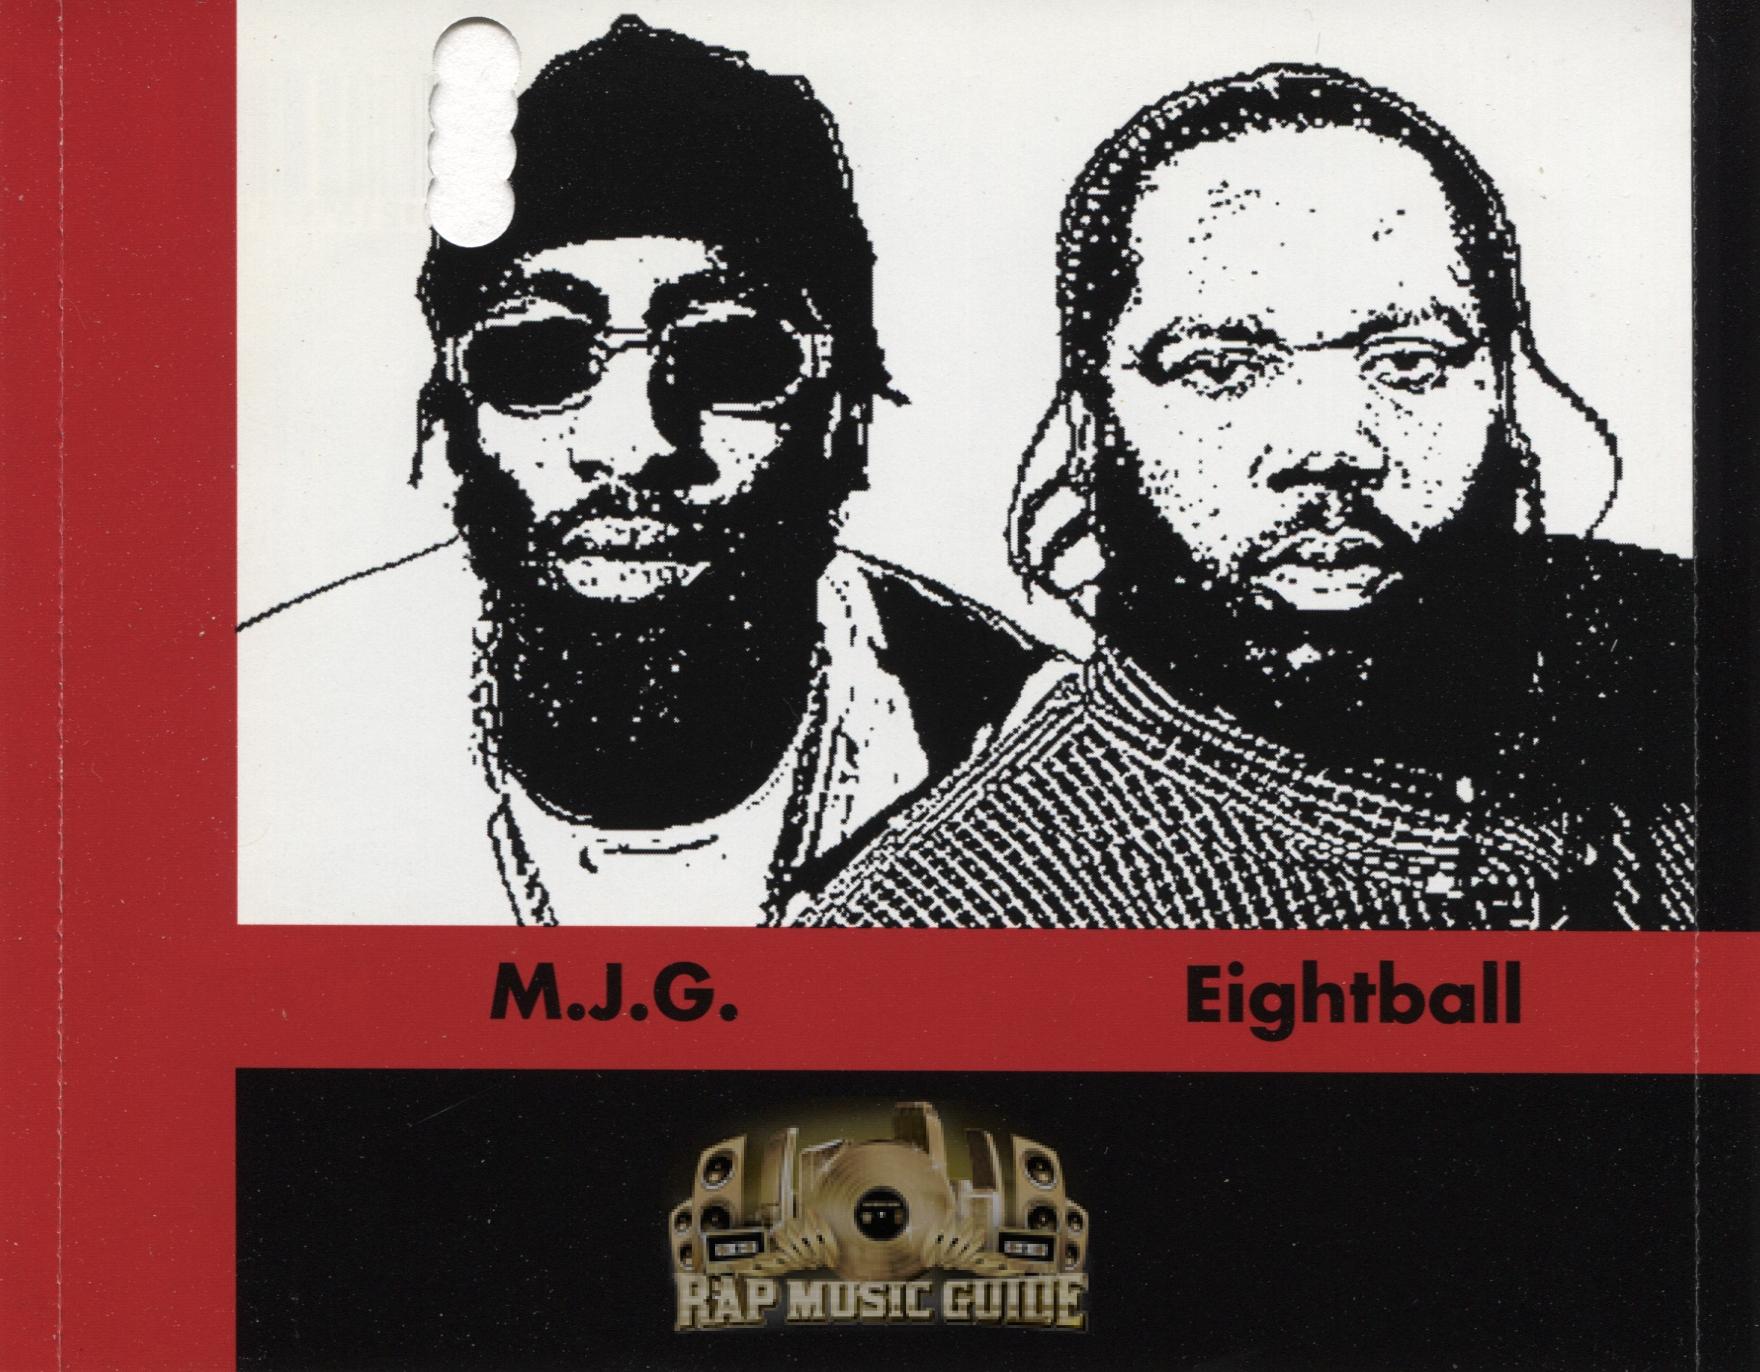 Eightball & M.J.G. Eightball & MJG Just Like Candy